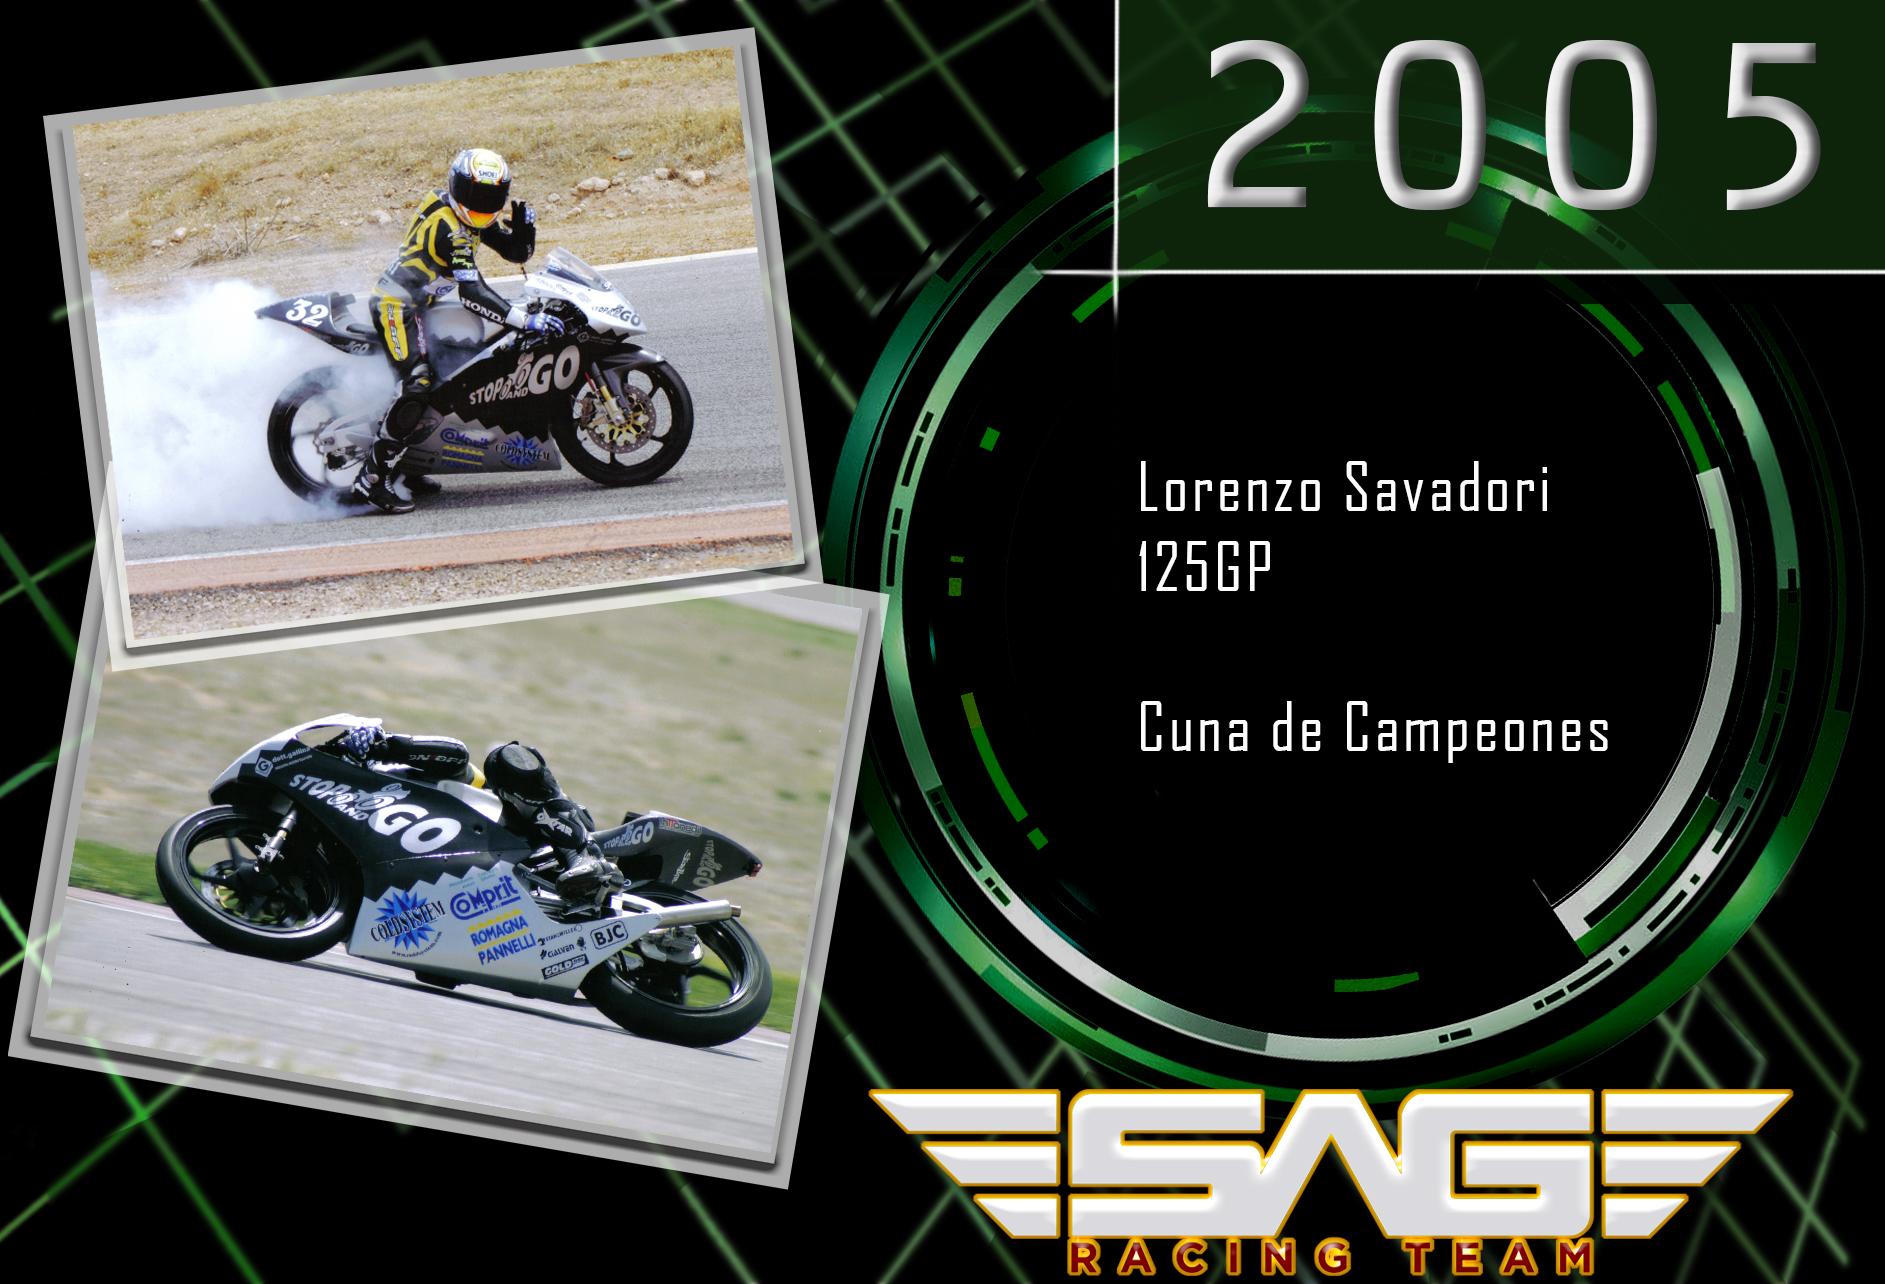 Cuna de Campeones rider Lorenzo Savadori (125GP)